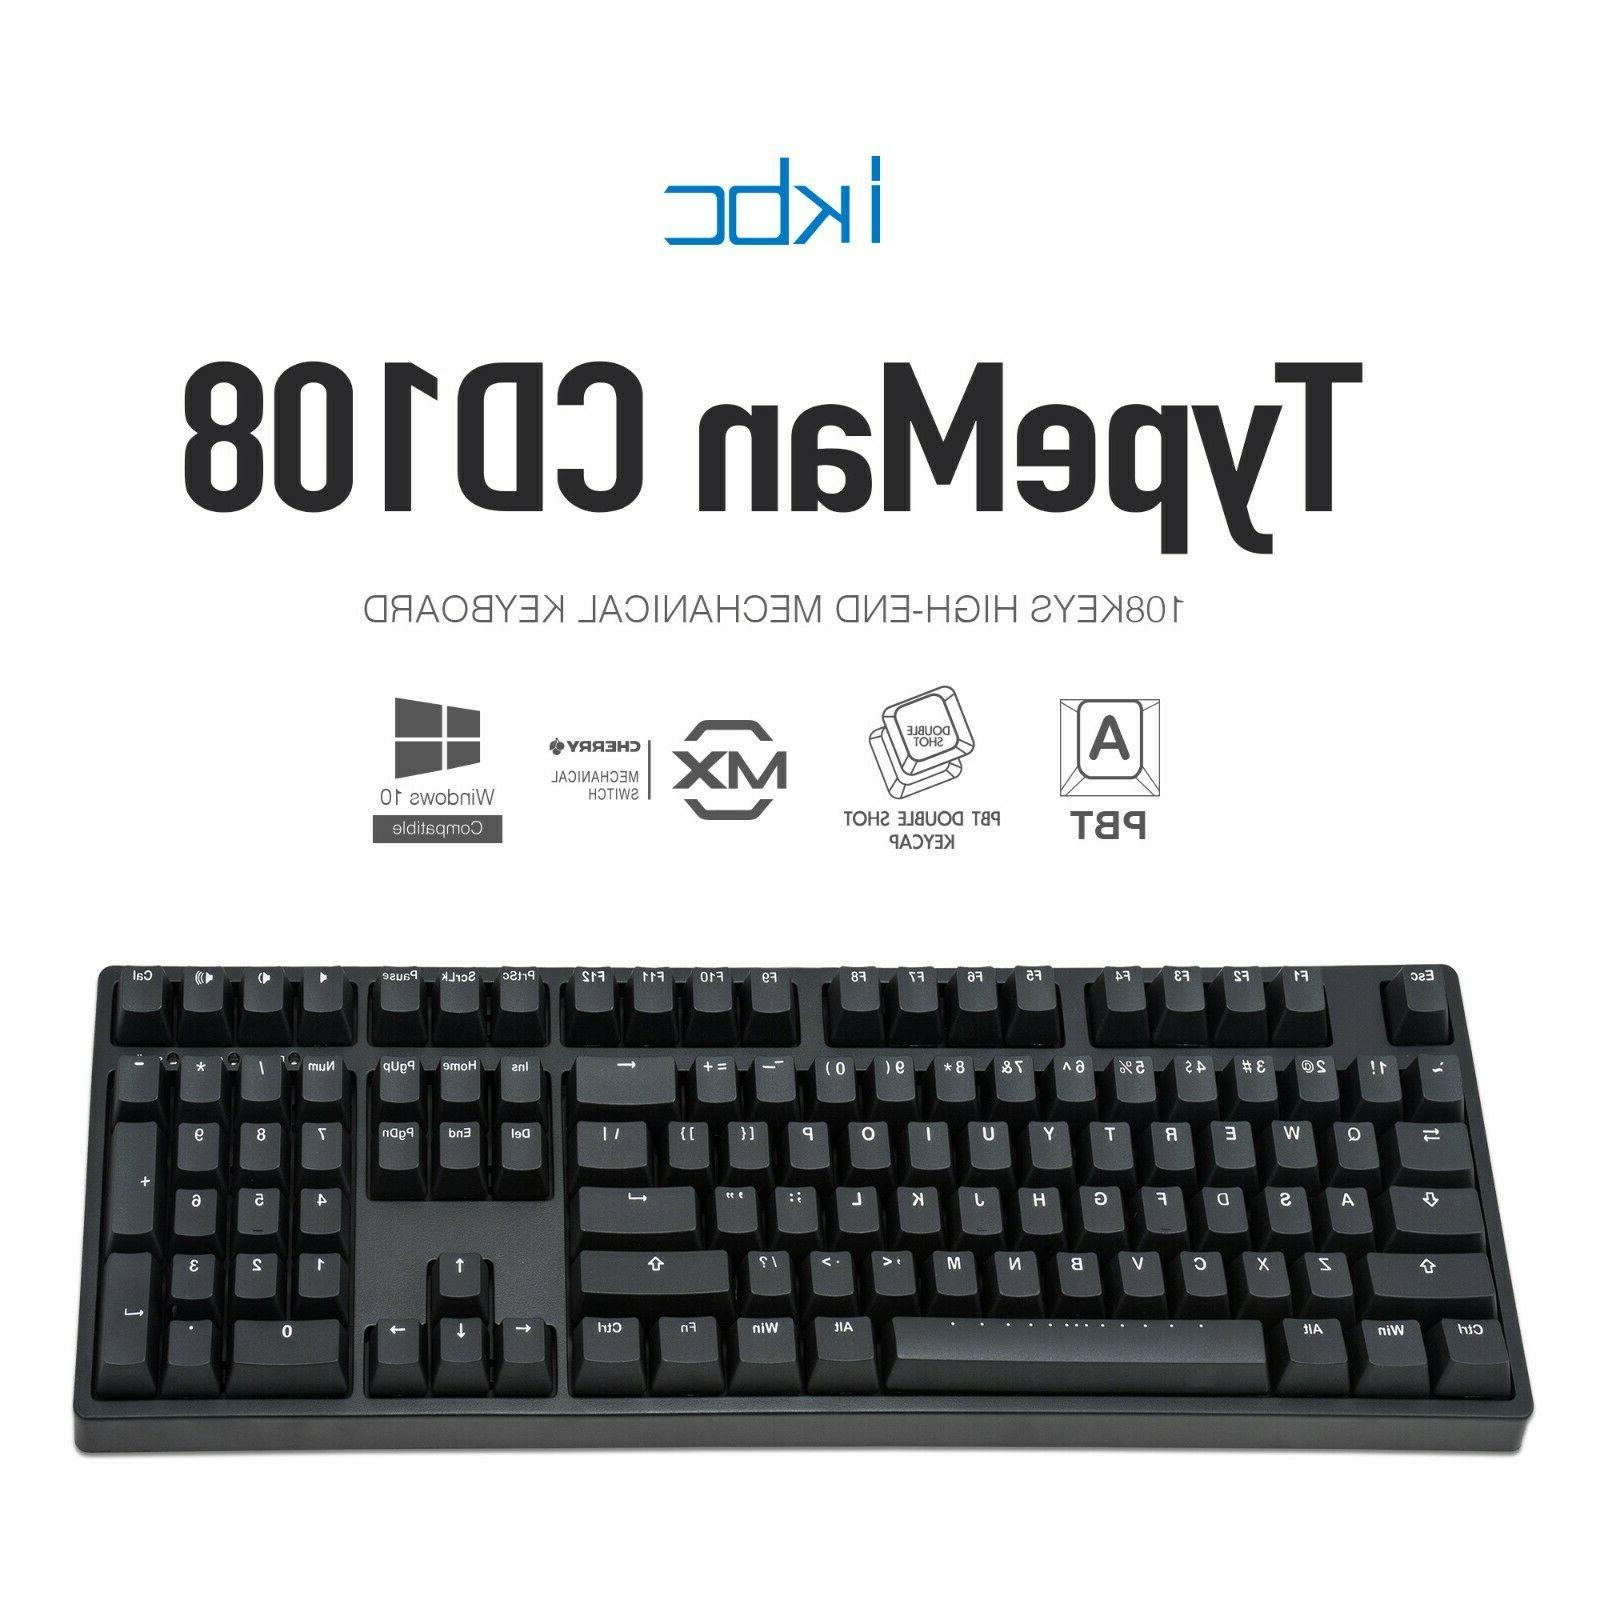 cd108 v2 mechanical ergonomic keyboard with cherry